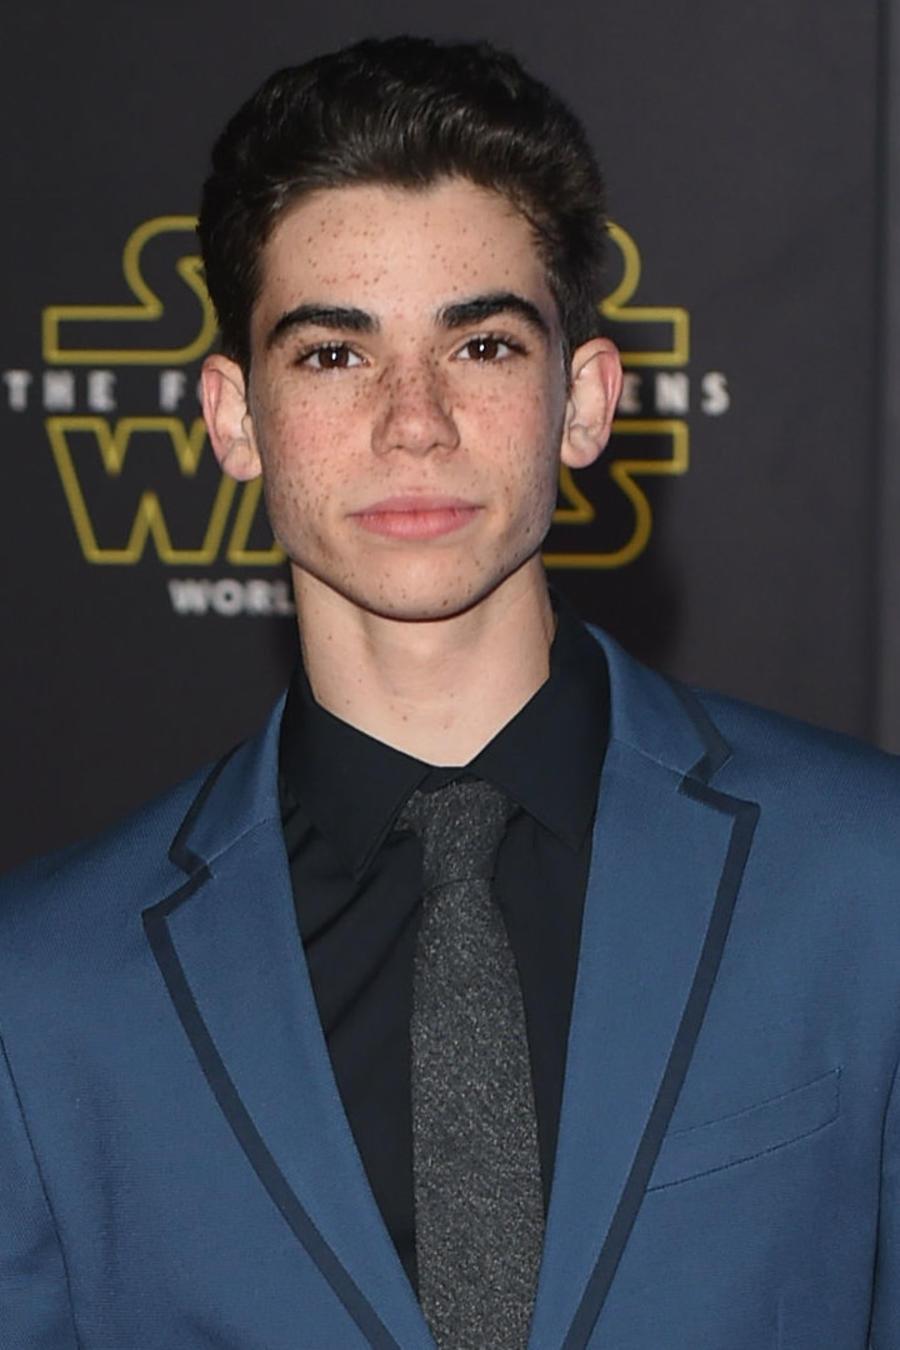 Cameron Boyce en la premiere de Star Wars